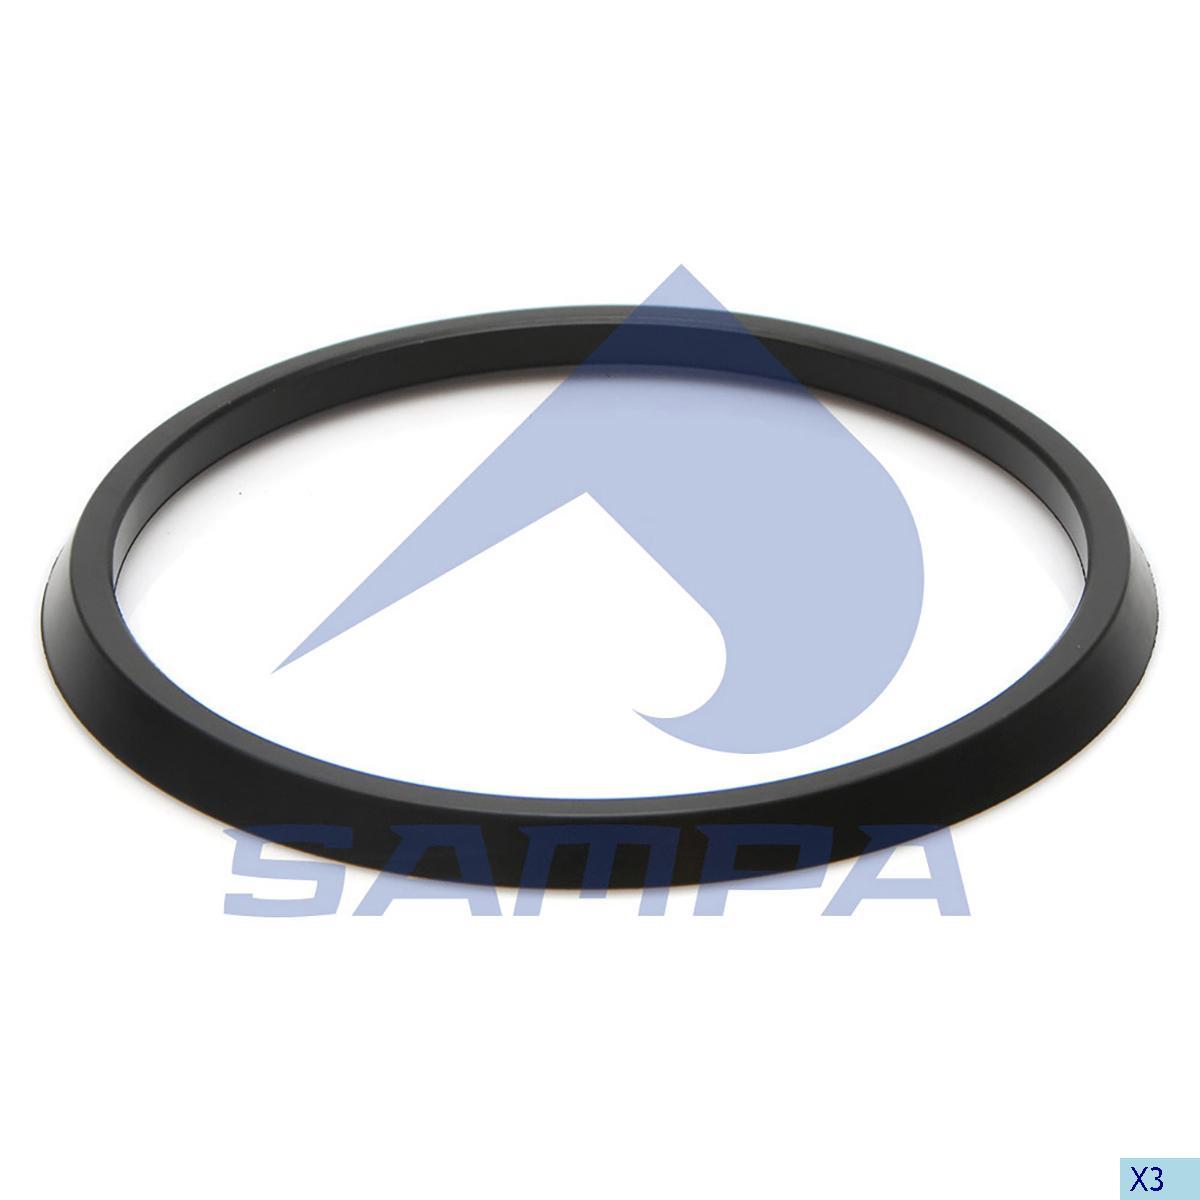 Seal Ring, Bogie Suspension, Ror-Meritor, Suspension